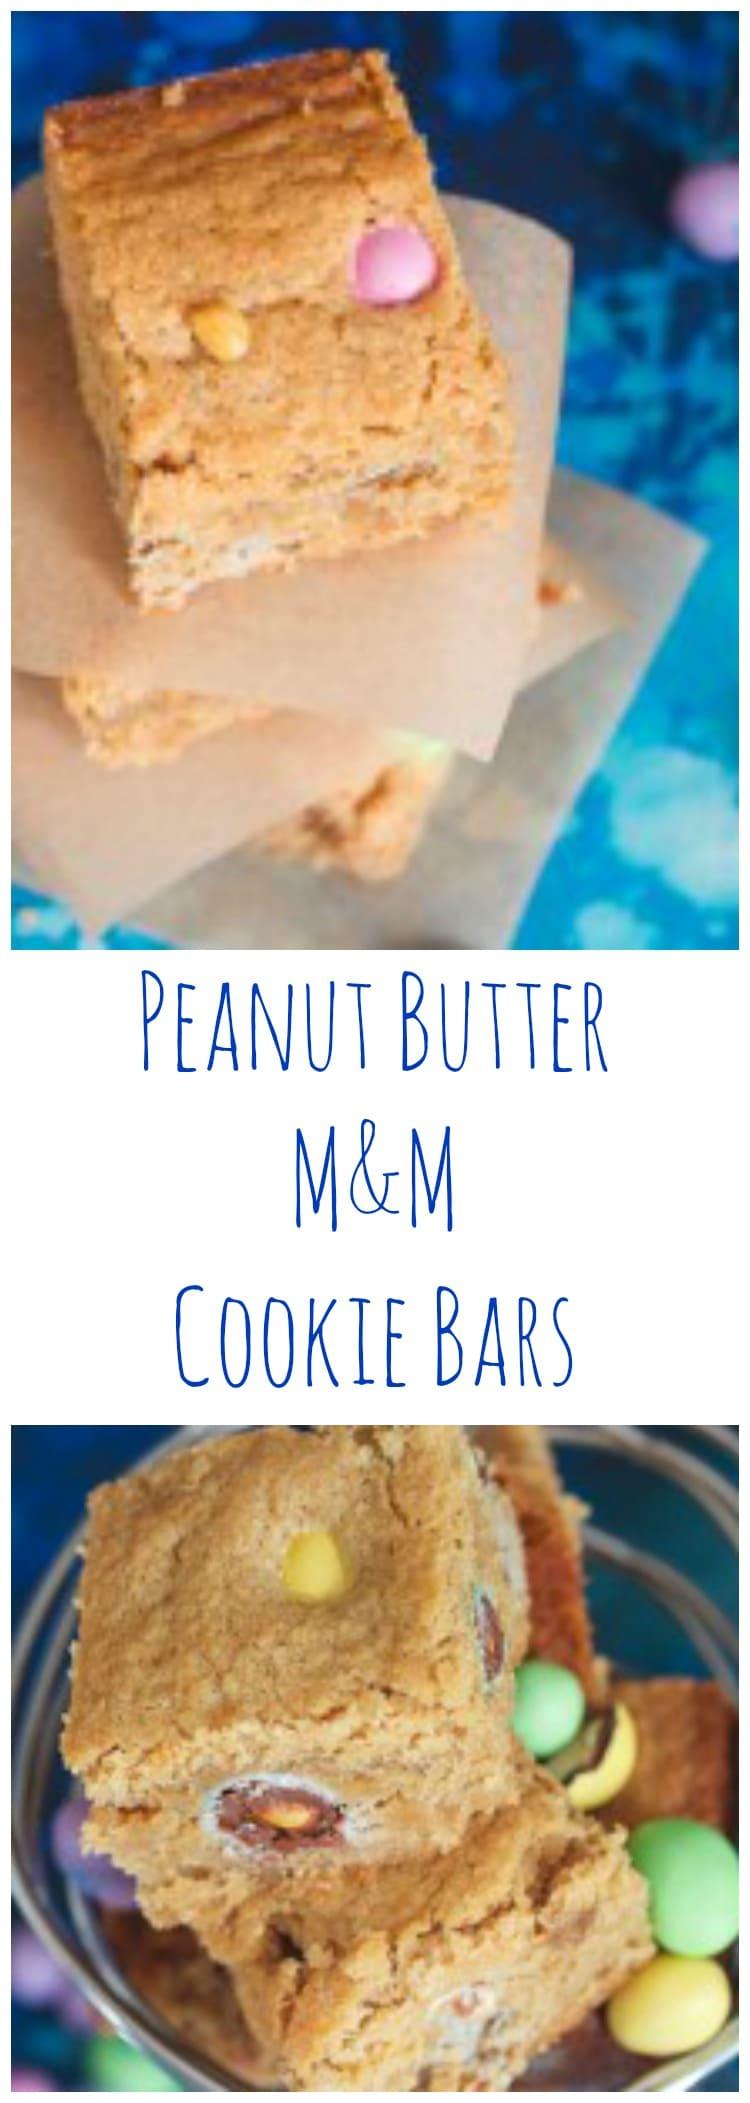 Peanut Butter Bars with Peanut M&M's